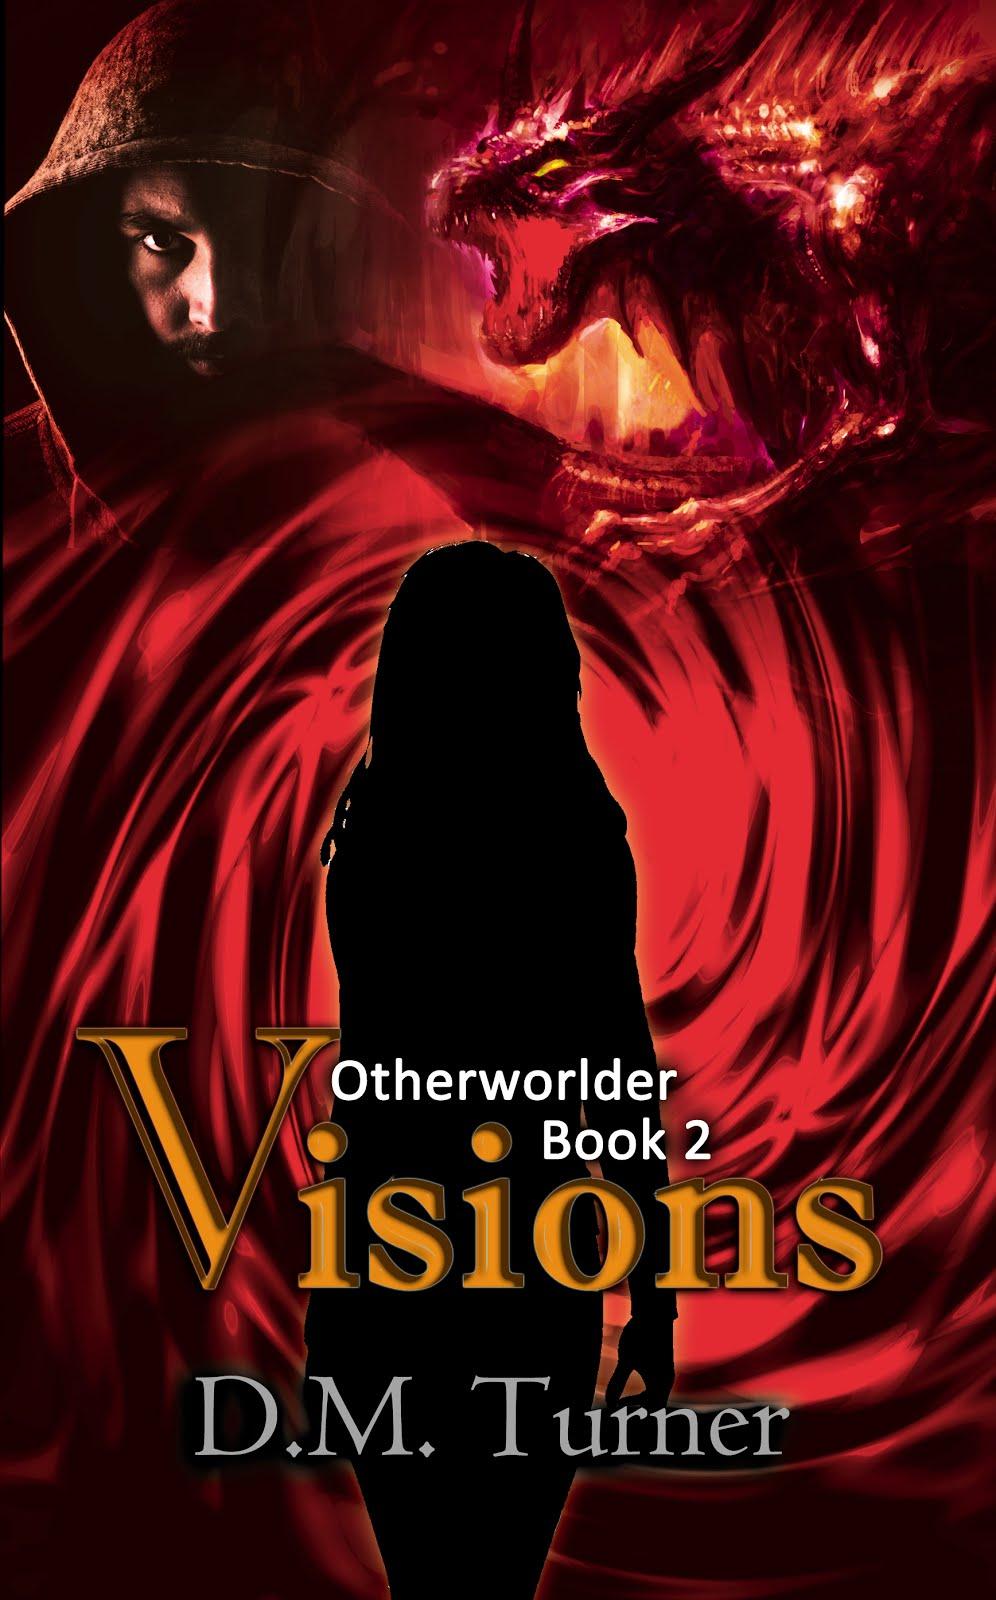 Visions - Otherworlder Book 2